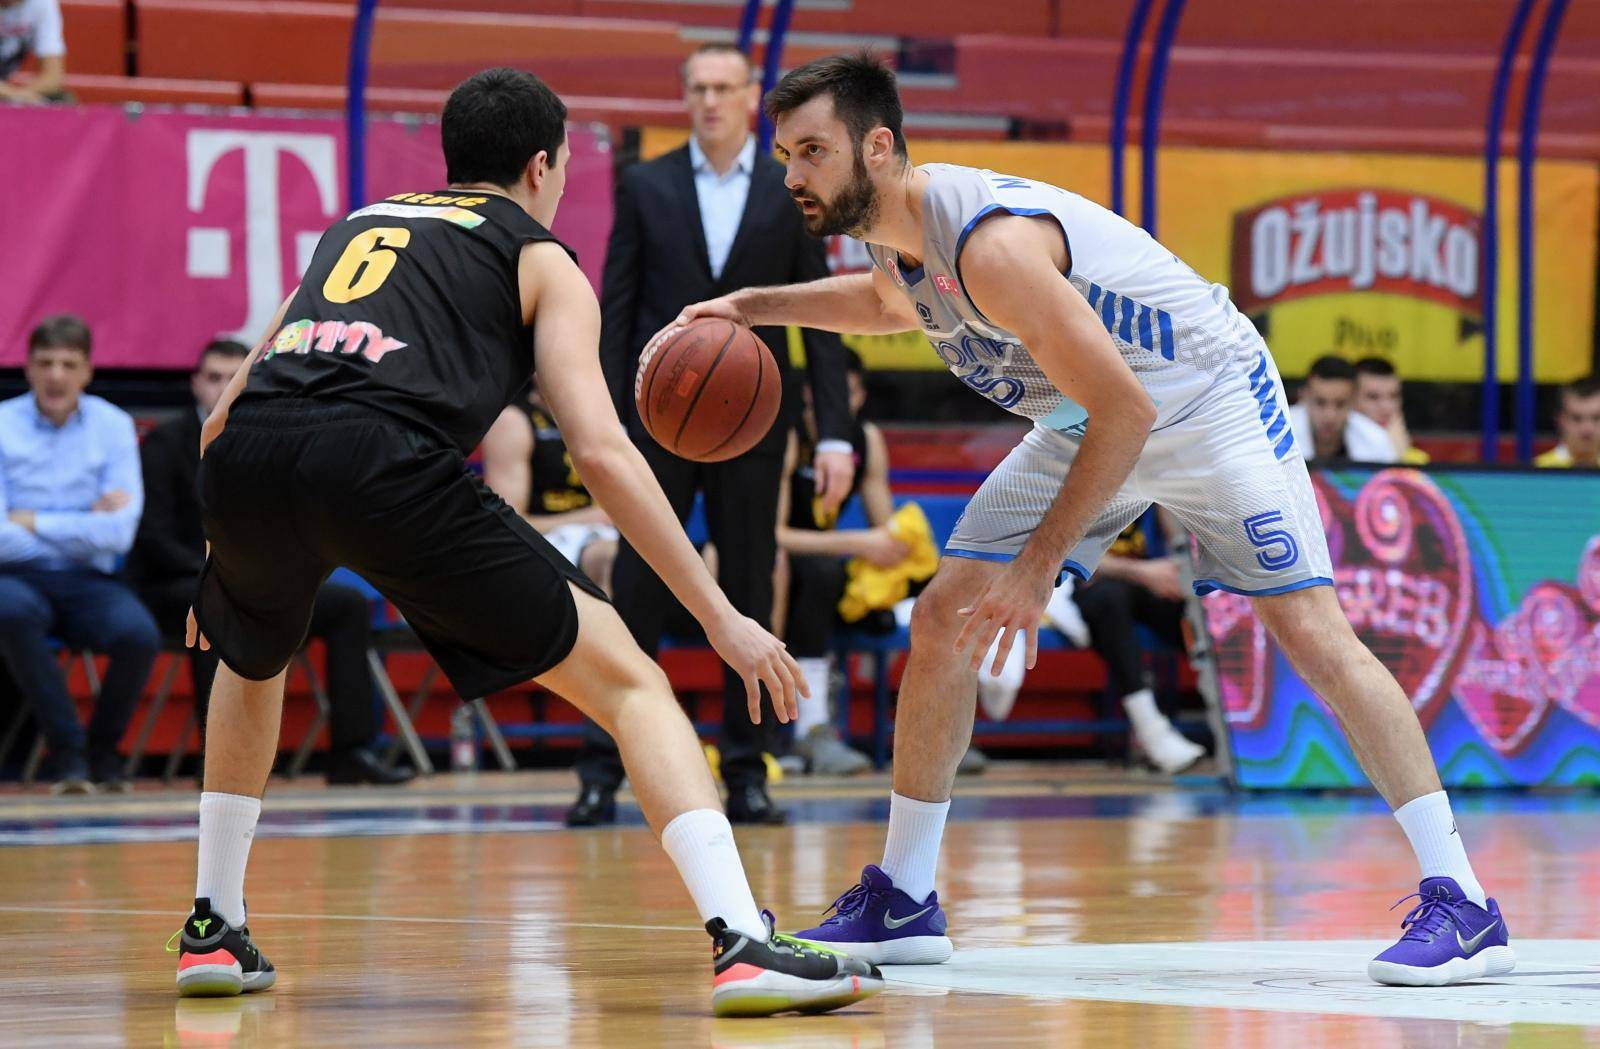 Cibona 'trokorakom' u finale, Zadar uspio 'slomiti' Cedevitu!